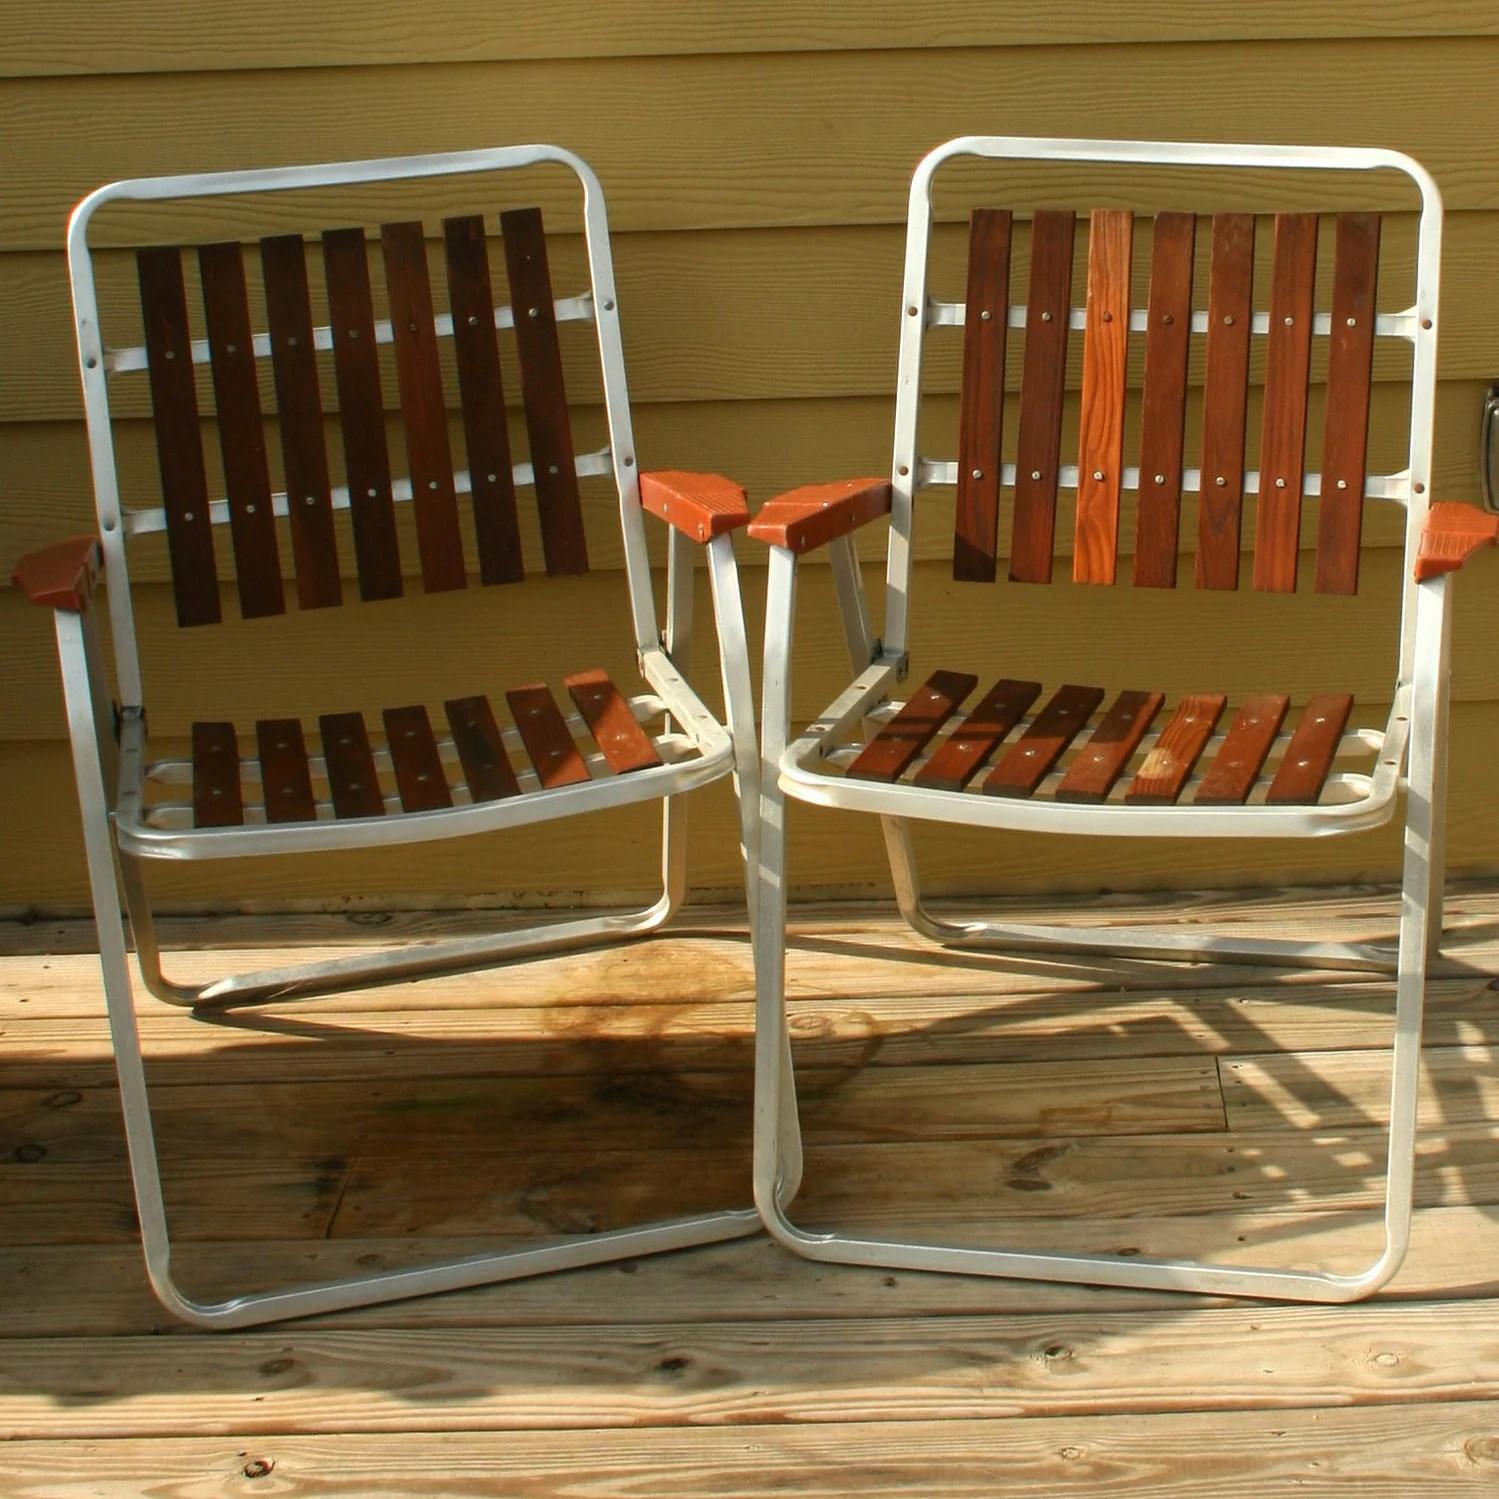 Vintage Folding Lawn Chairs Mid Century Modern Wooden Slats